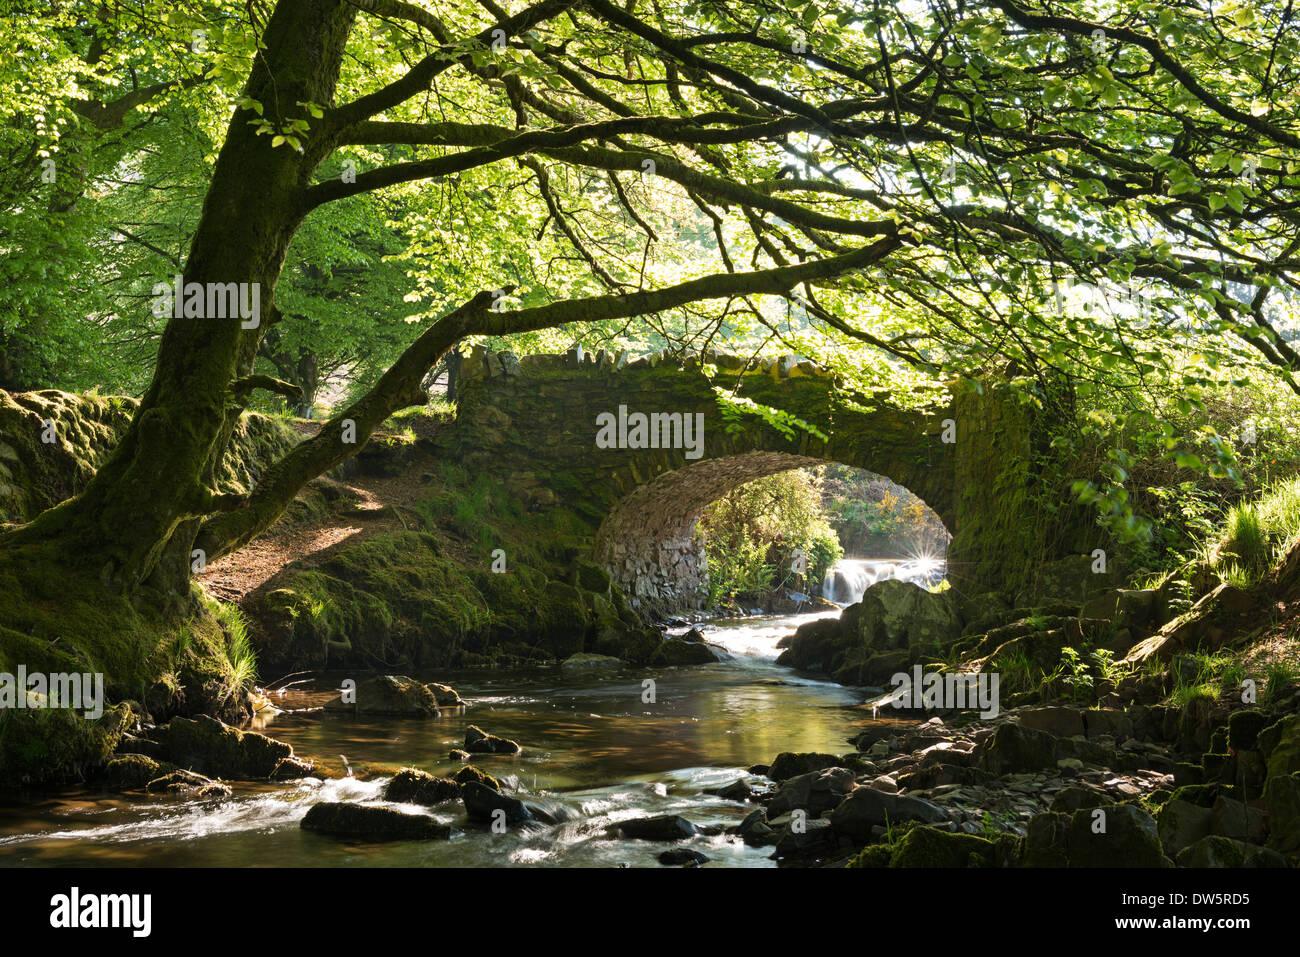 Pont du voleur pittoresque près de Oare, Exmoor, Somerset, Angleterre. Printemps (mai) 2013. Photo Stock